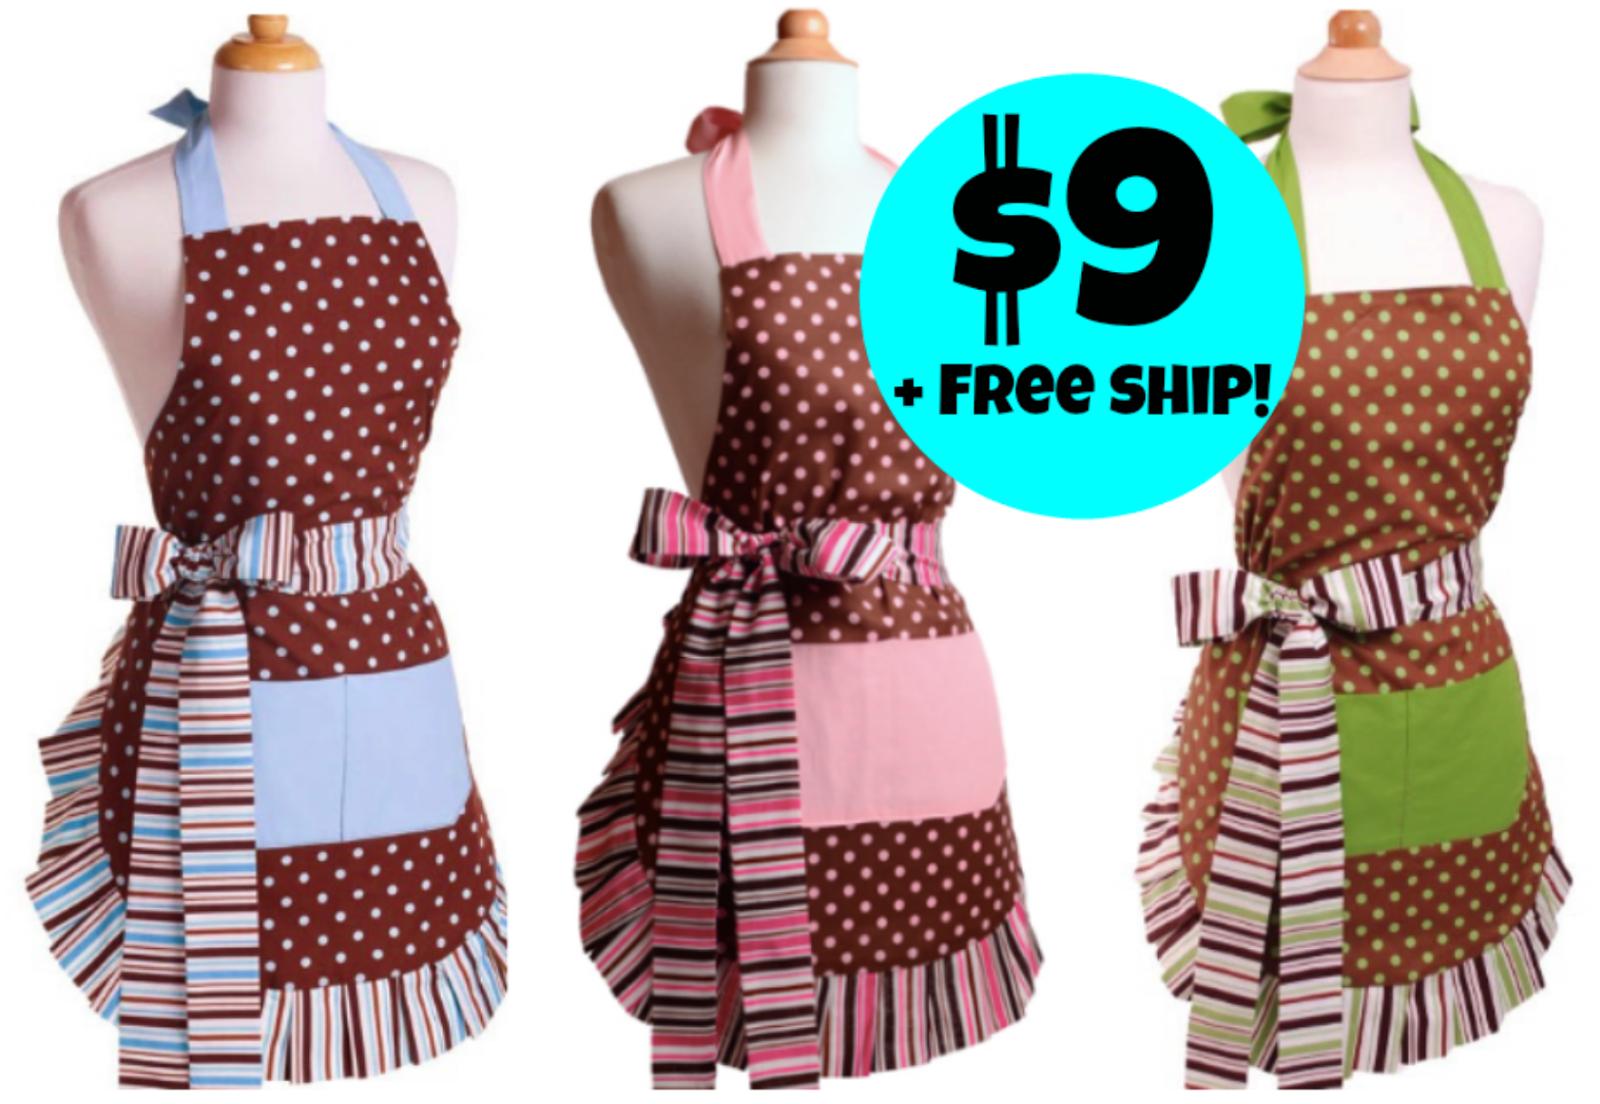 http://www.thebinderladies.com/2015/02/flirty-aprons-womens-chocolate-aprons.html#.VOTALkLduyM